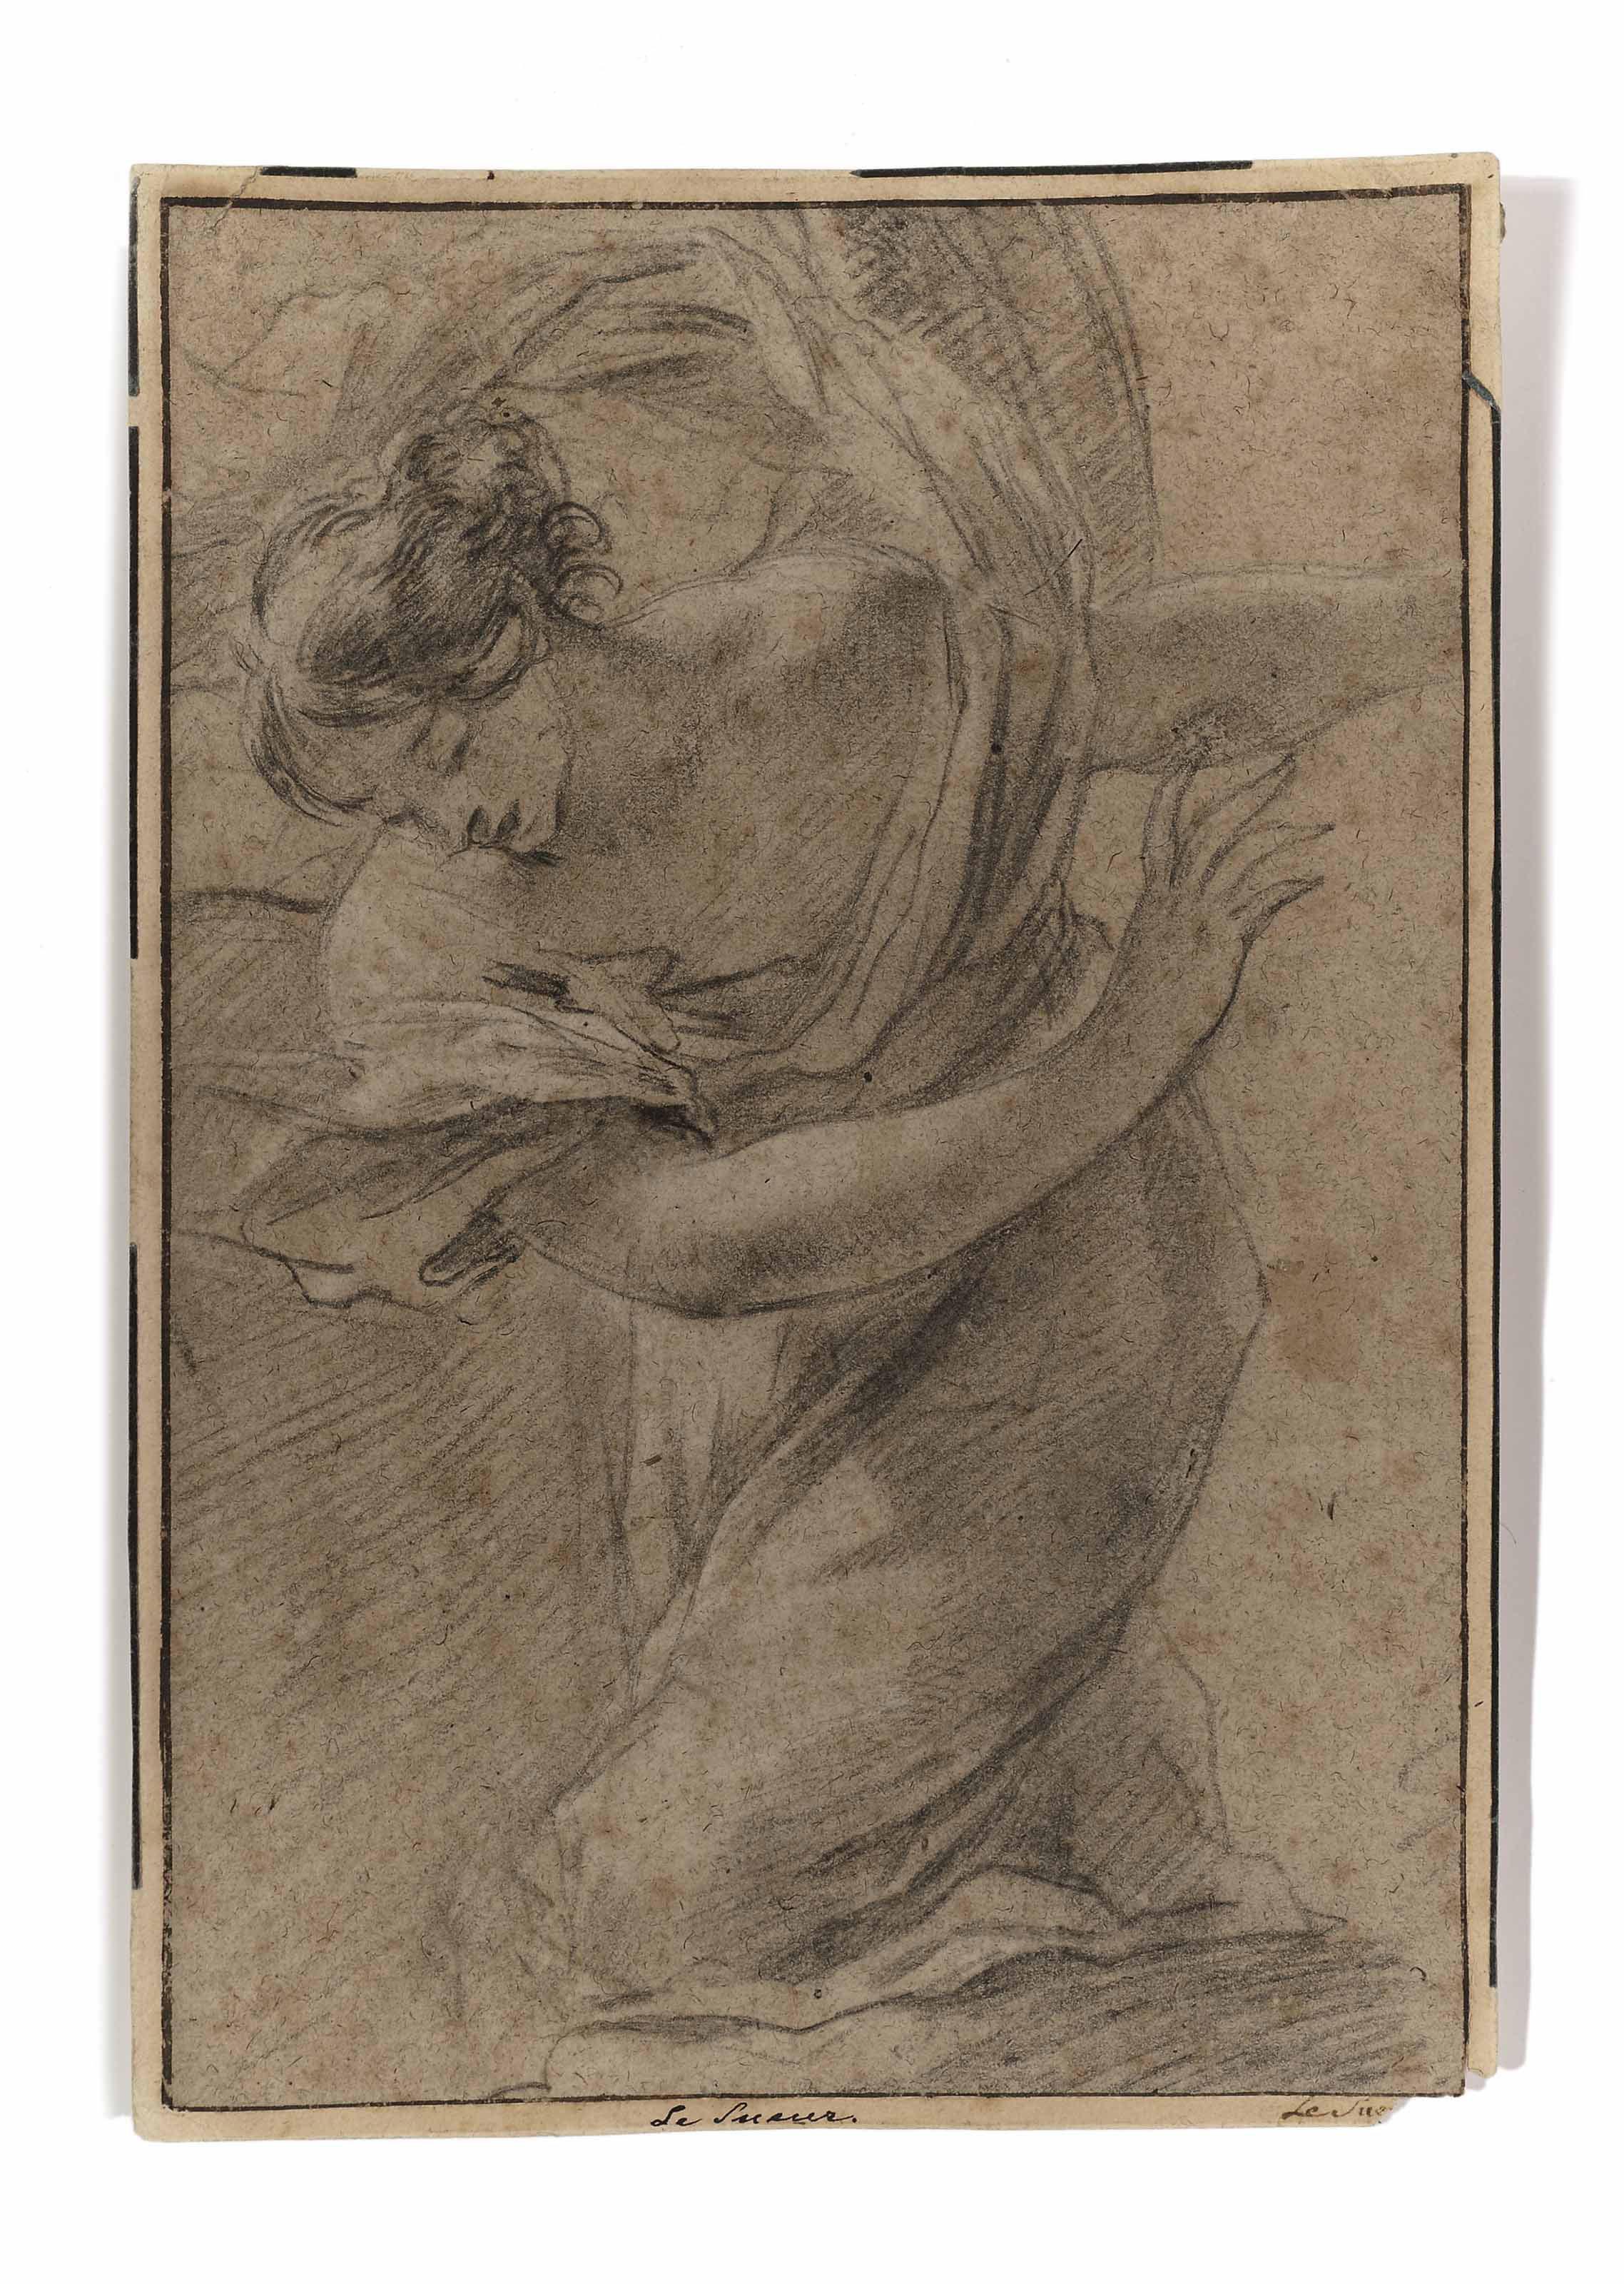 A kneeling woman in a billowing mantle